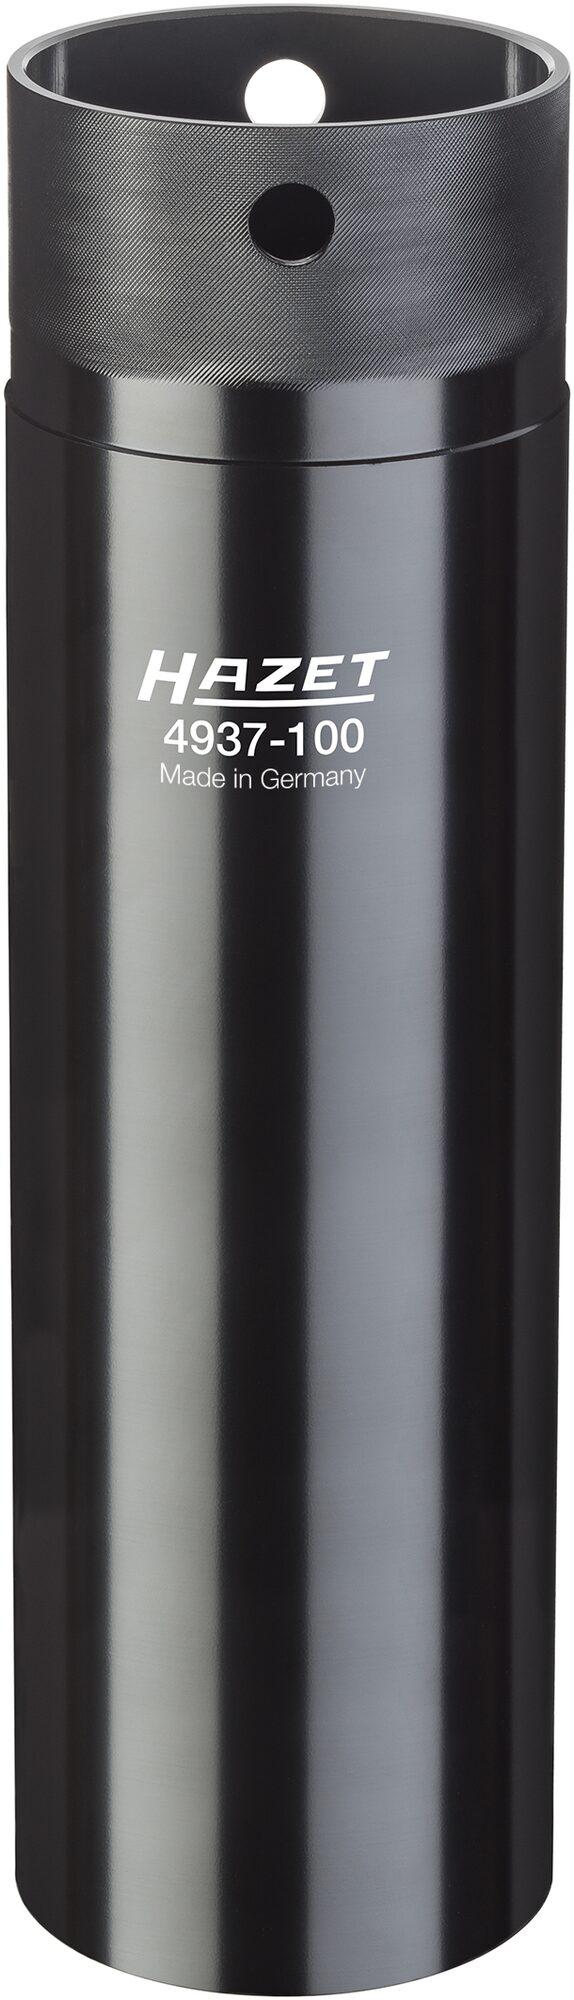 HAZET Nkw Montagehülse MAN ∙ Gewinde M100x1,5 4937-100 ∙ 105 mm